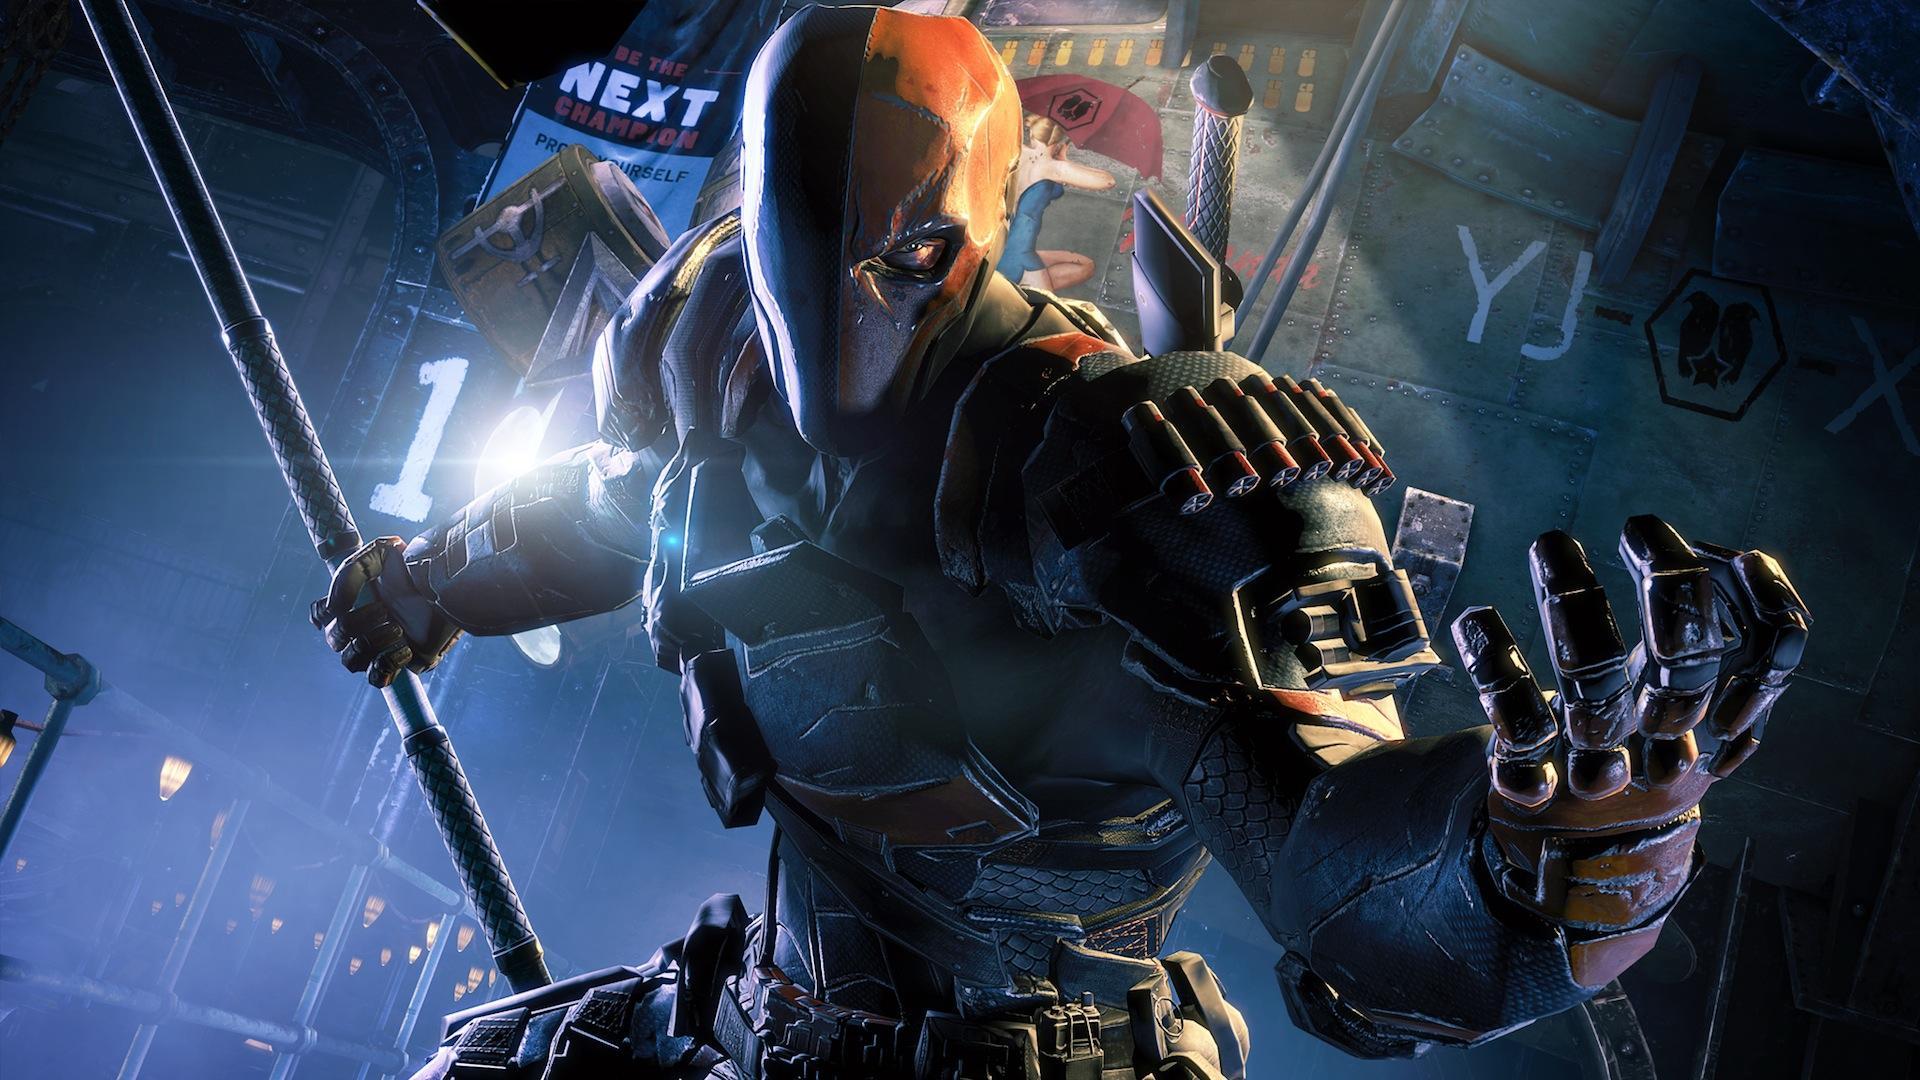 Batman Arkham Origins - Deathstroke wallpaper background